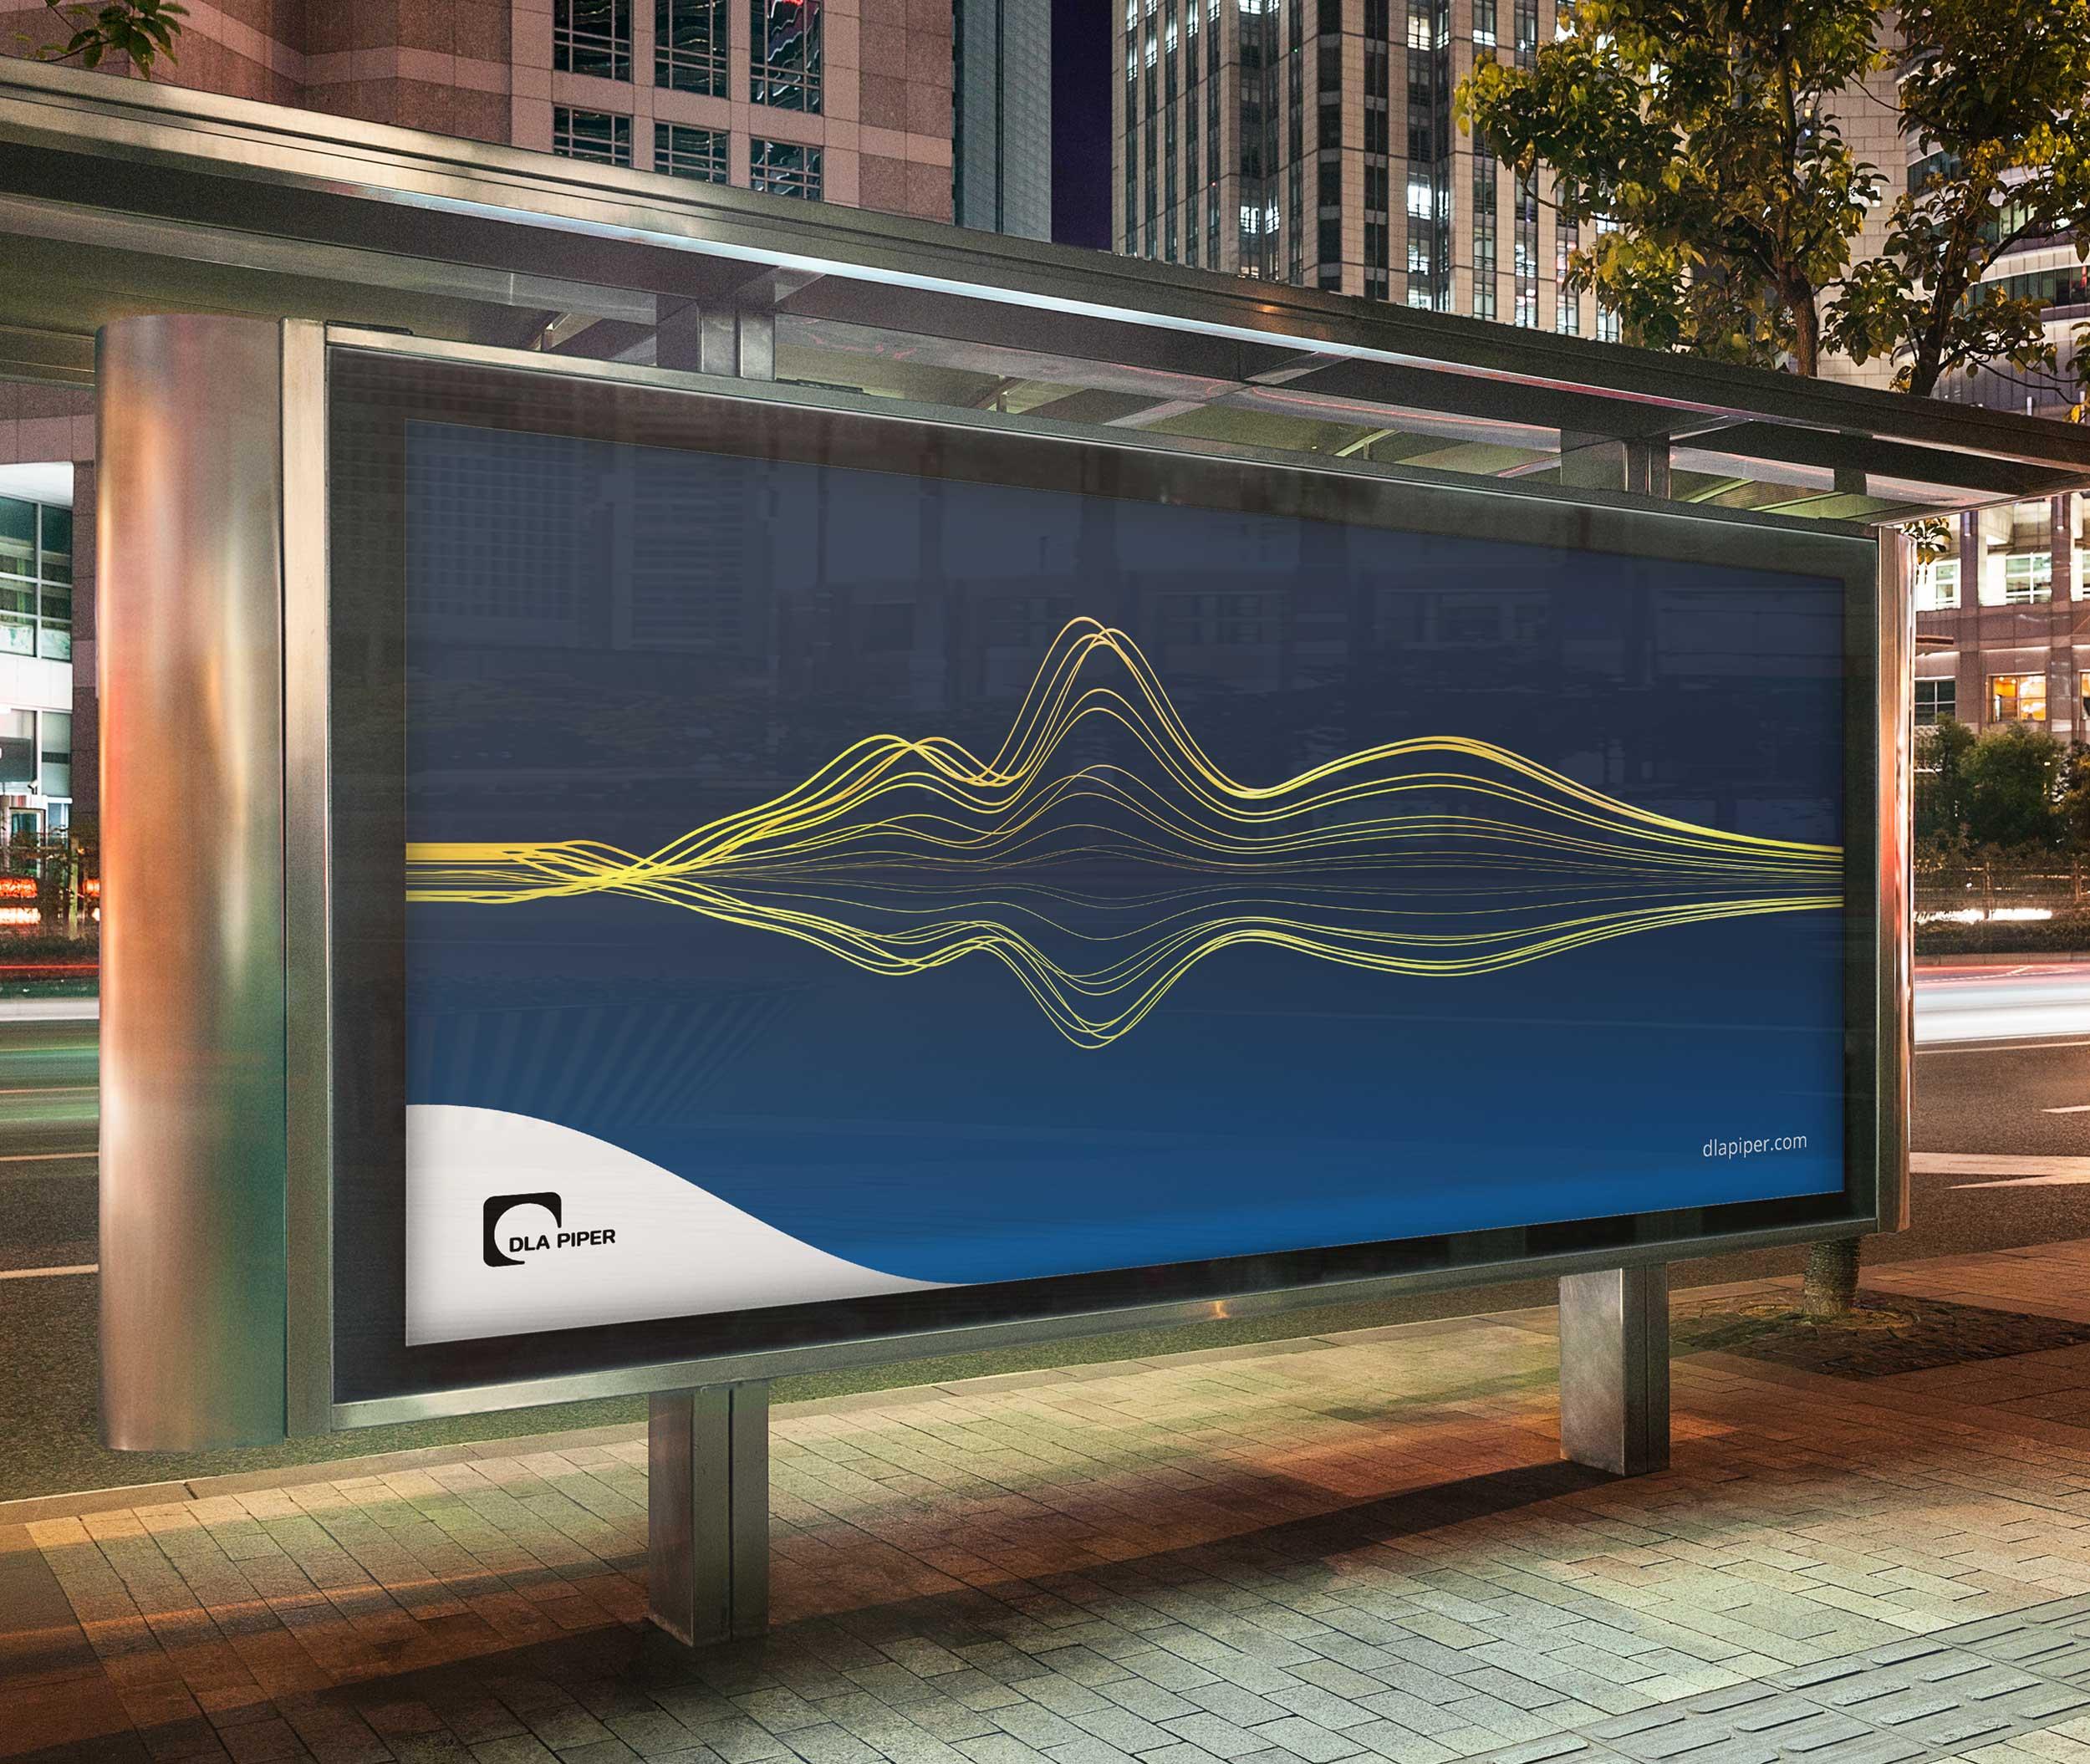 A billboard advertisement showing a DLA Piper string sculpture